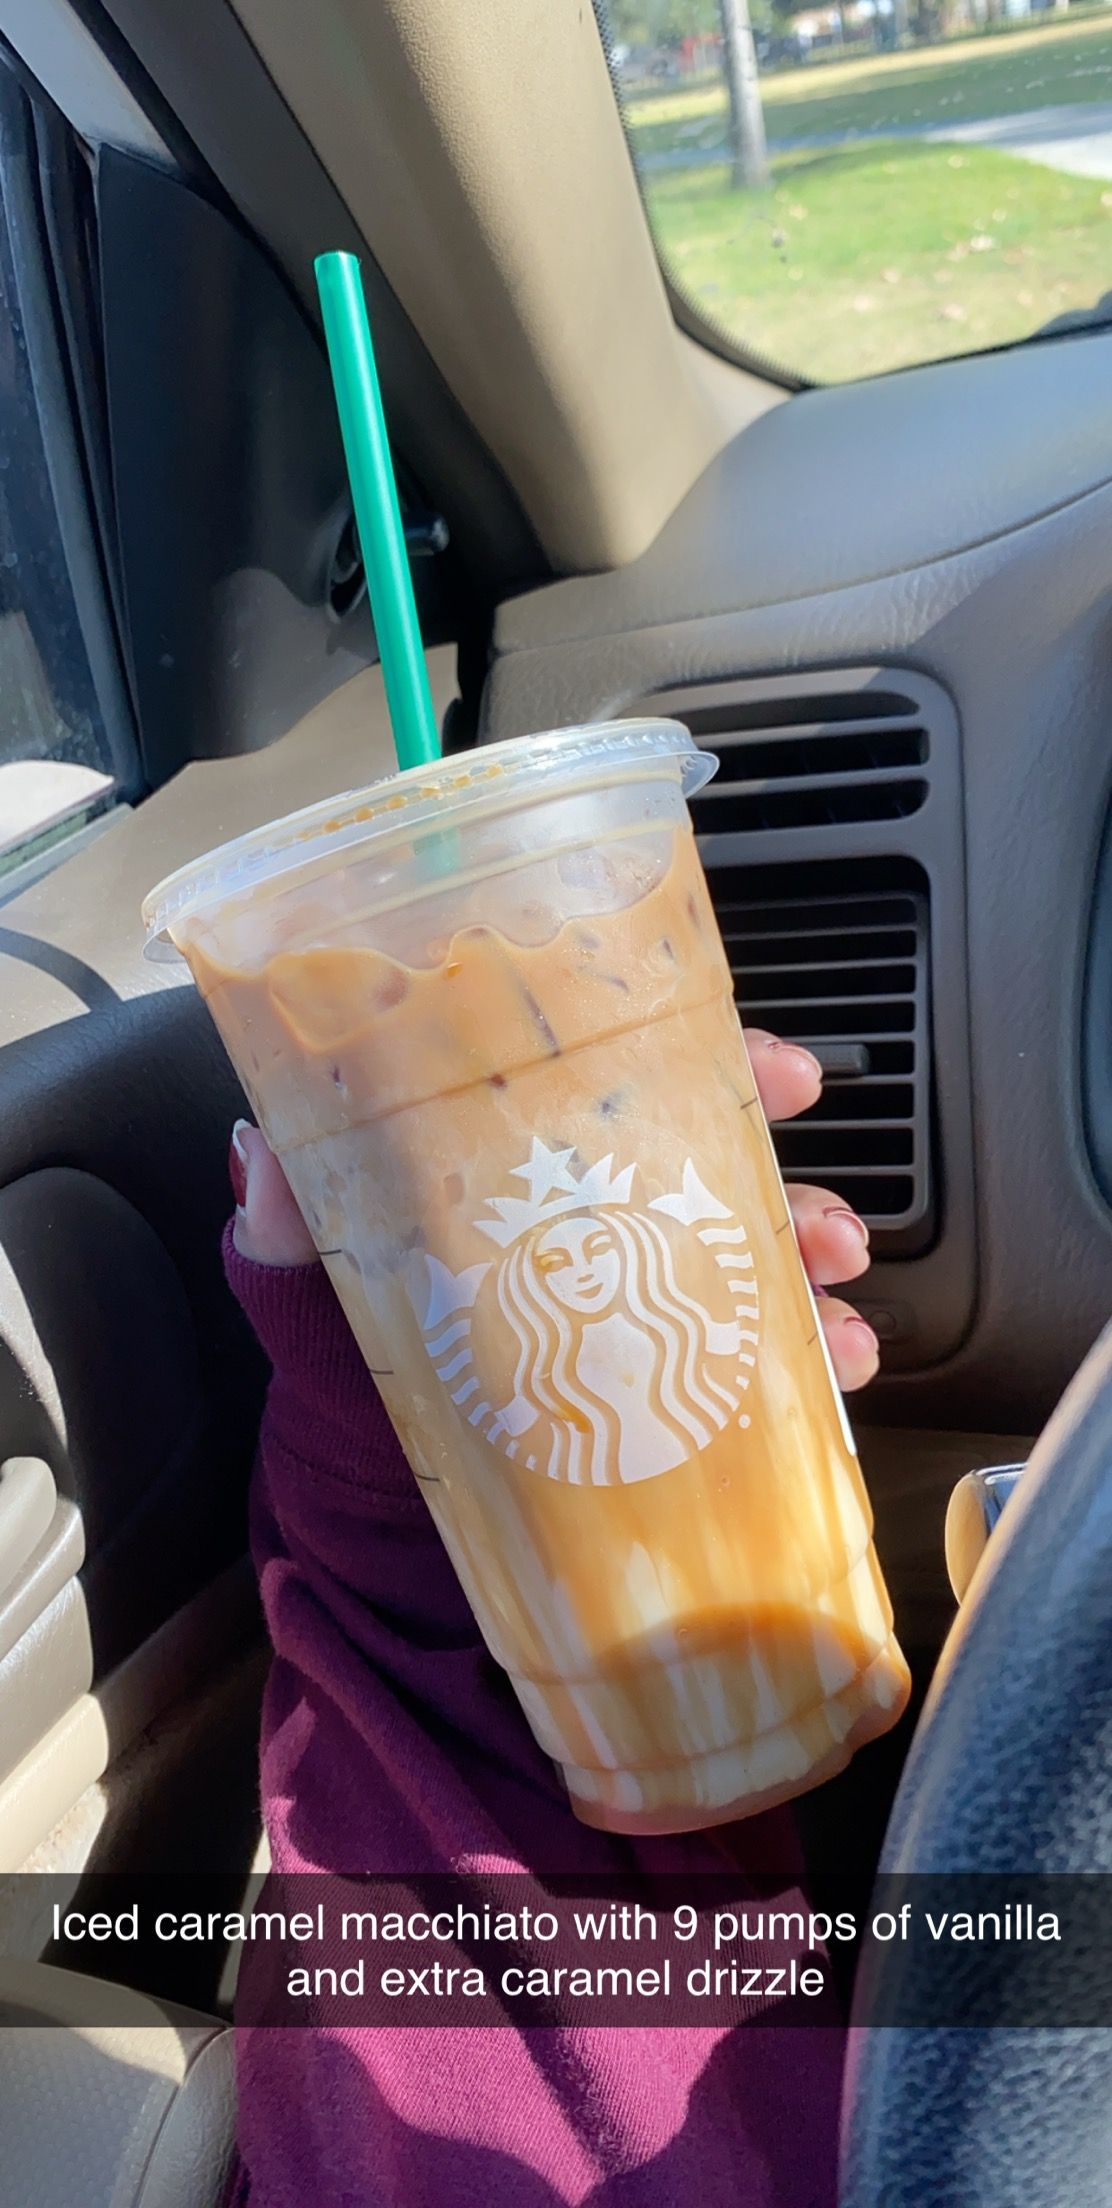 Pin By Hoshizaki America Inc On Starbucks Drinks Starbucks Drinks Recipes Secret Starbucks Recipes Healthy Starbucks Drinks